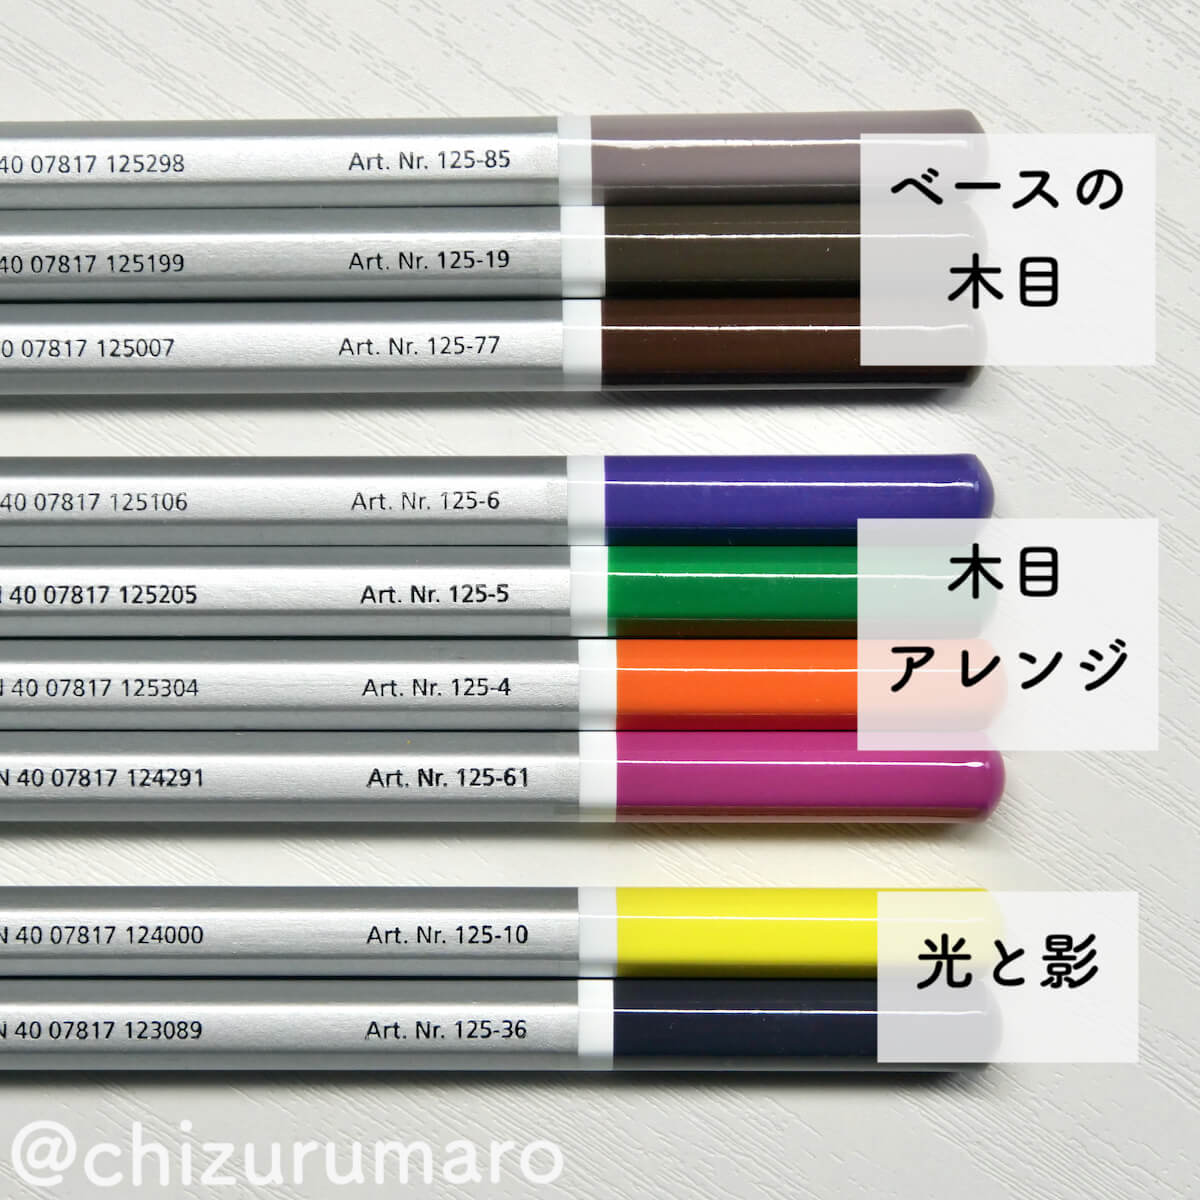 f:id:chizurumaro:20201203201733j:plain